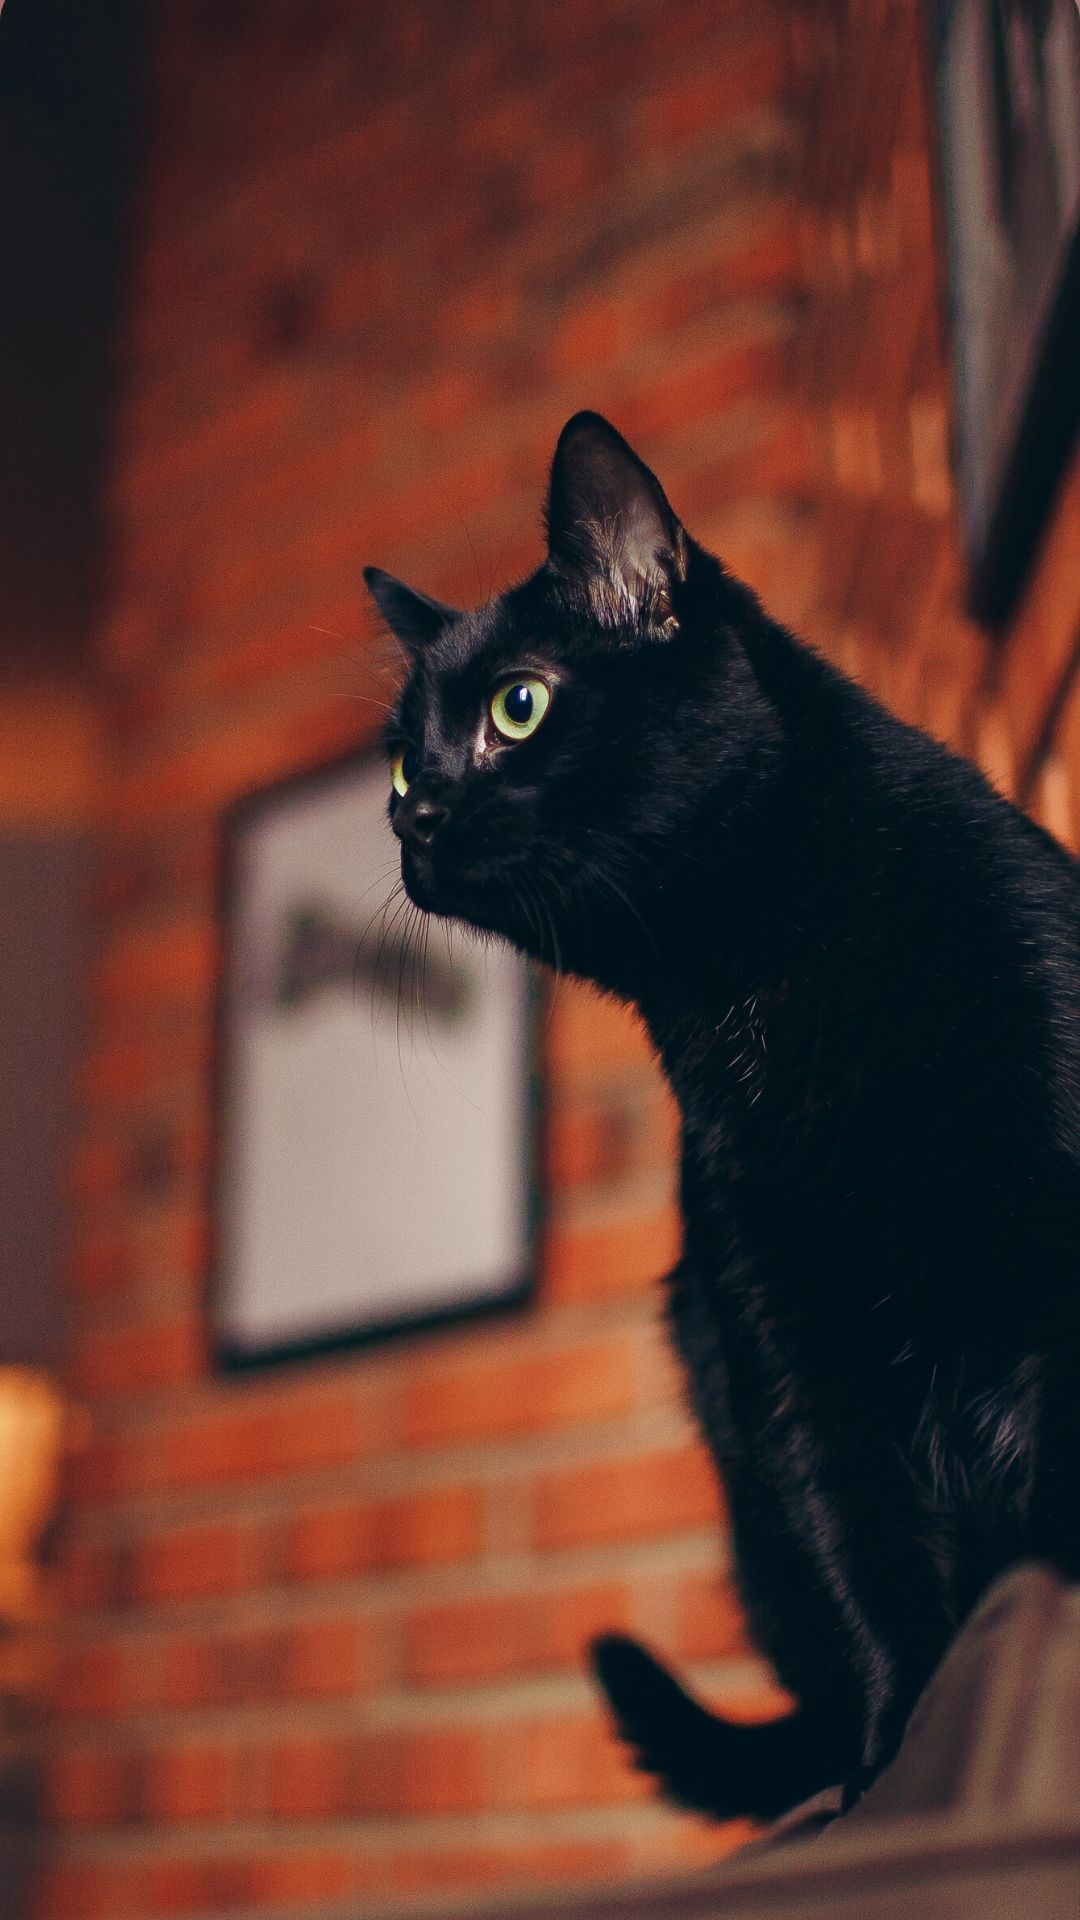 Iphone Black Cat Wallpaper In 2020 Cat Wallpaper Black Cat Aesthetic Cute Cat Wallpaper